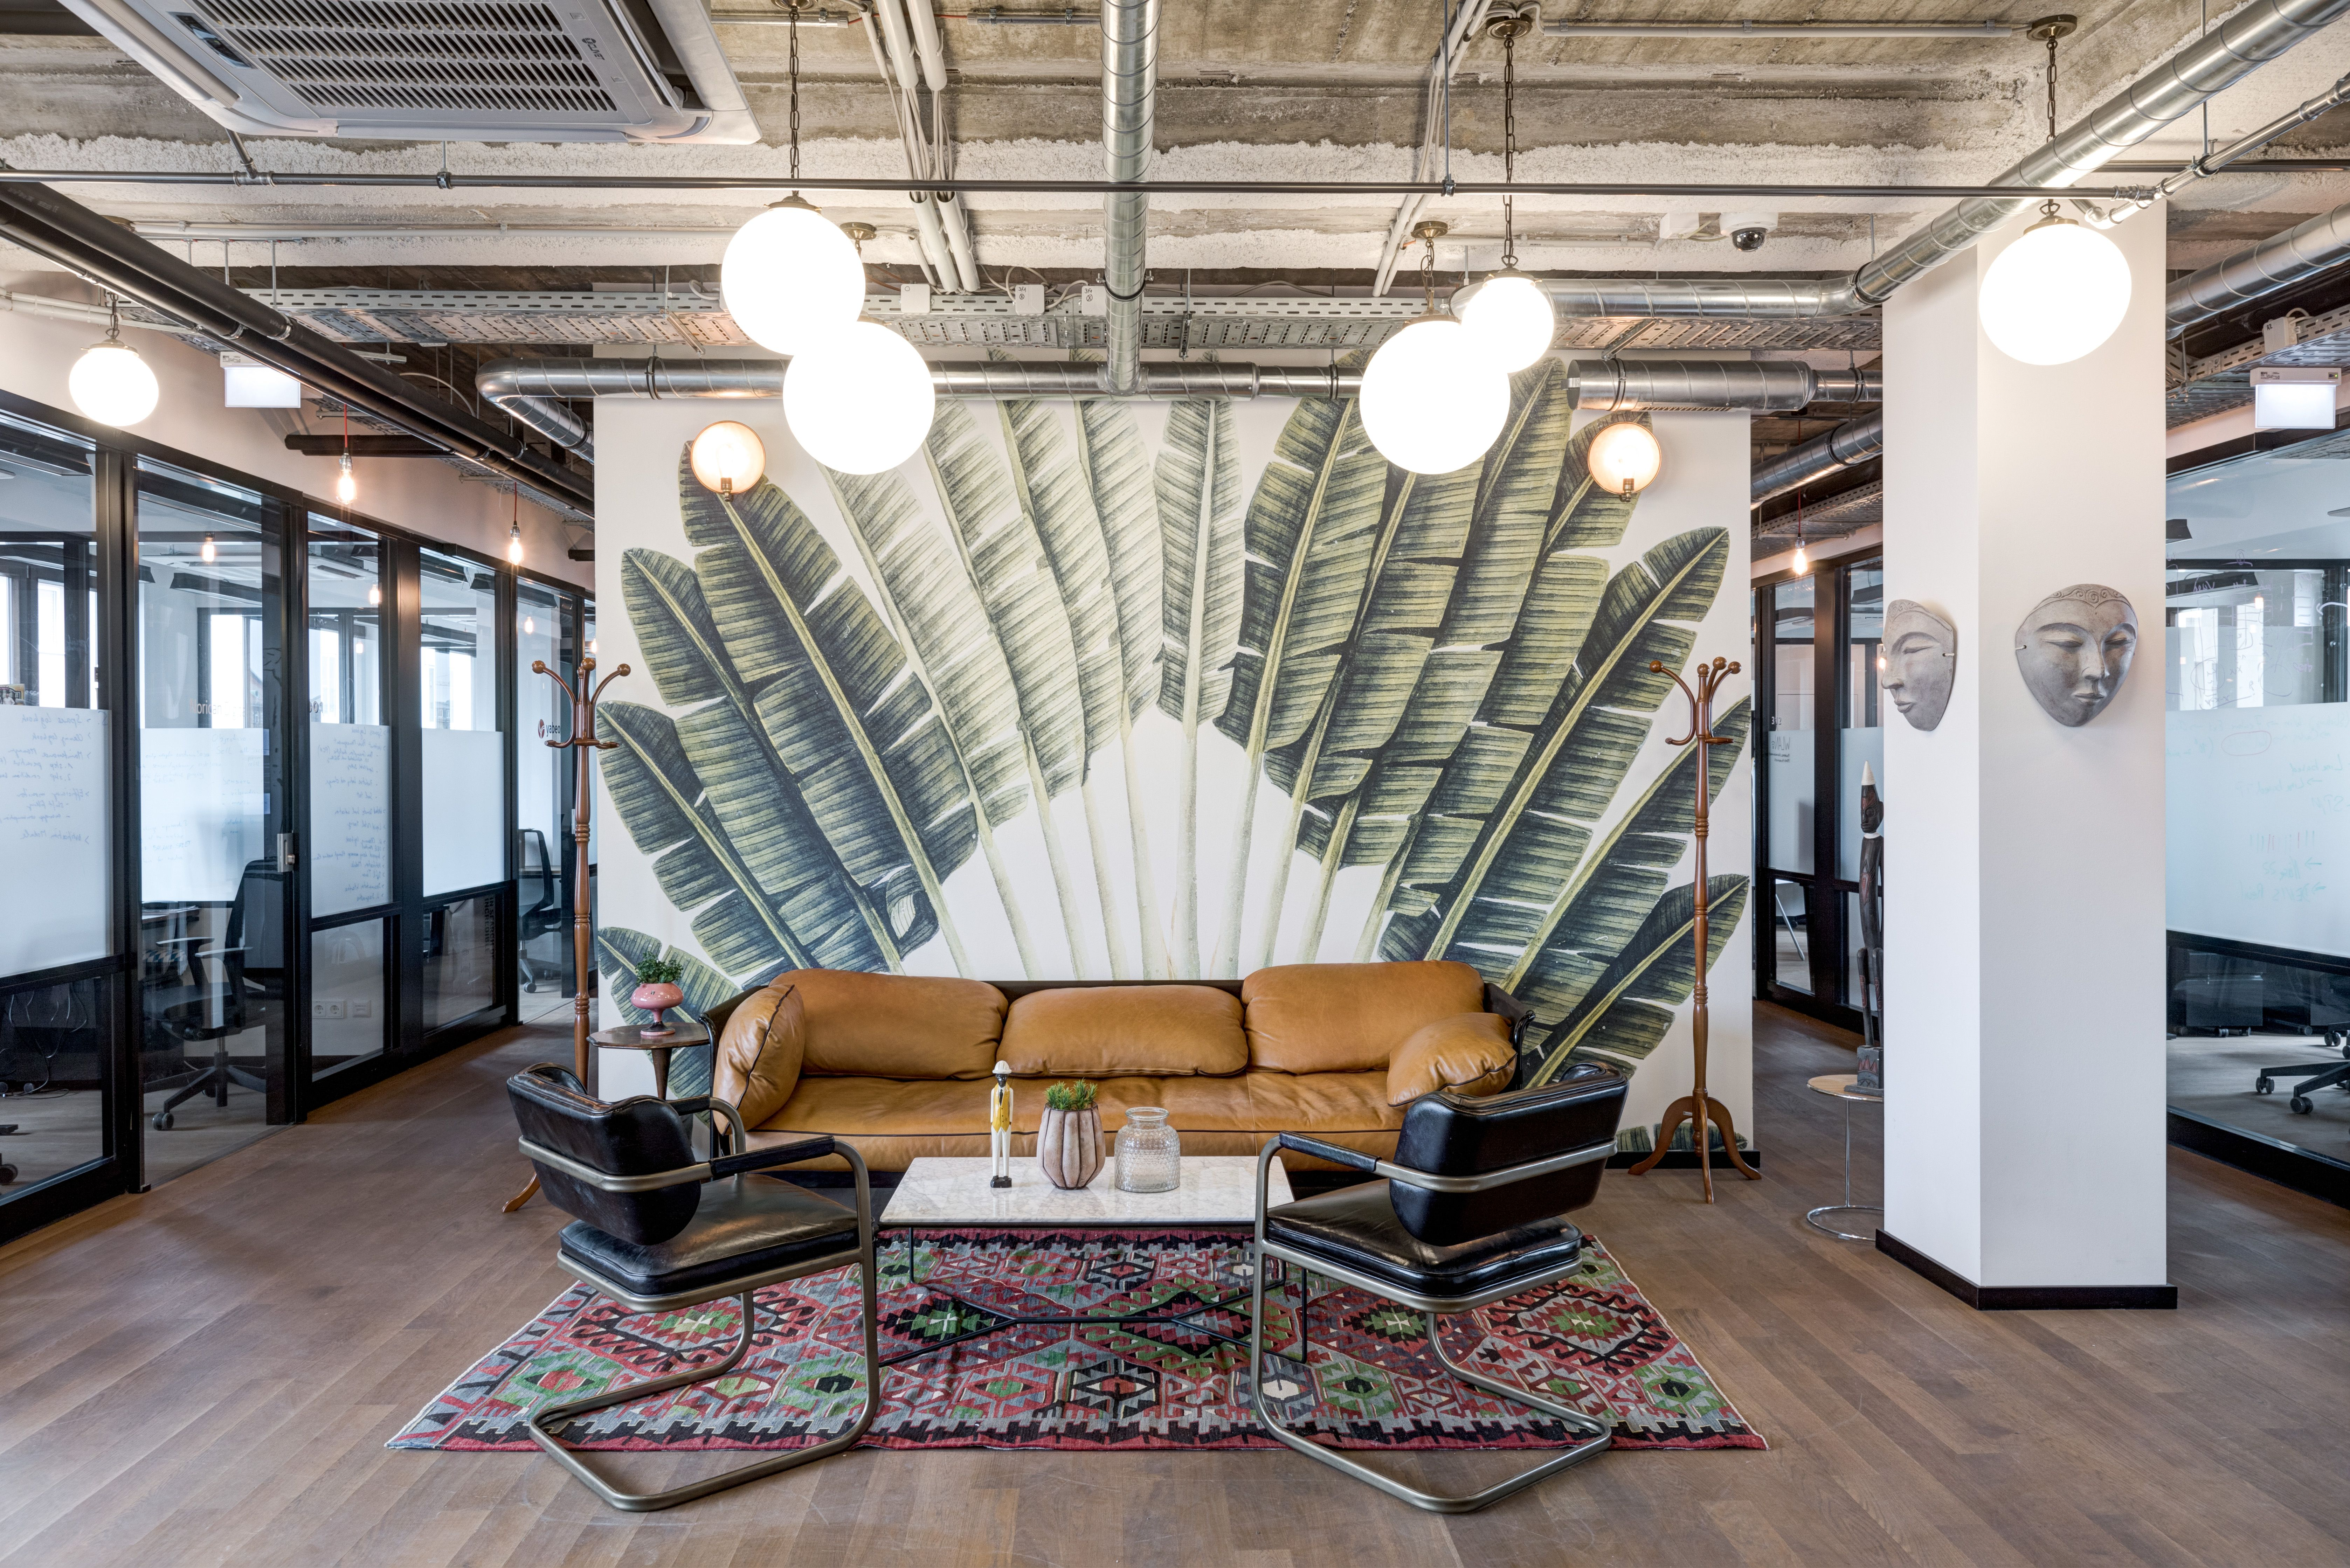 Office Lounge Area Design Decor Art Wallart Print Couches Furniture Rug Interiordesign Unique Office Lounge Area Shared Office Space Office Lounge